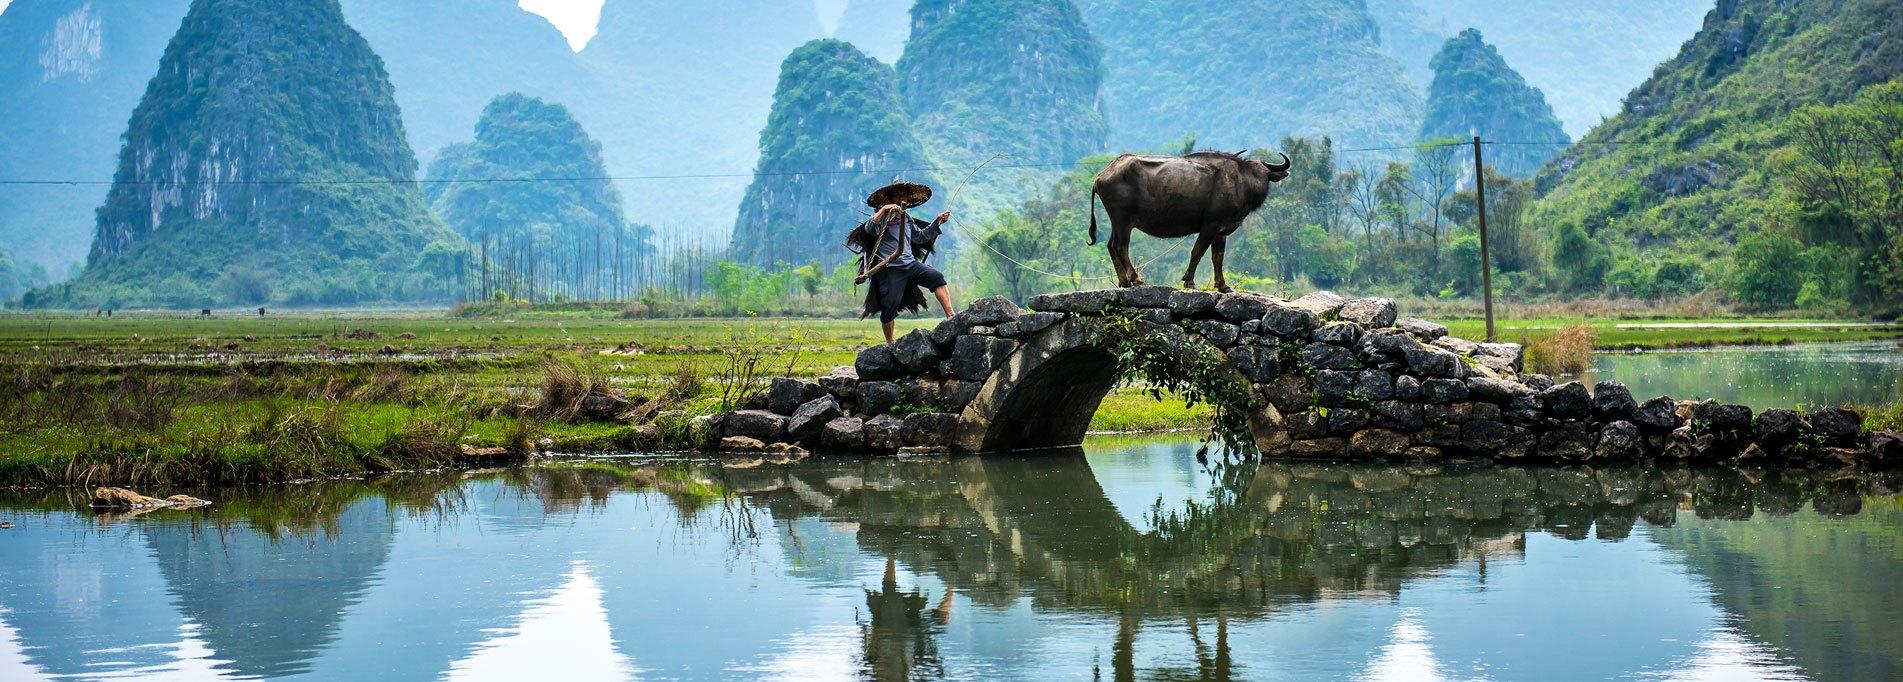 China Photography Tour